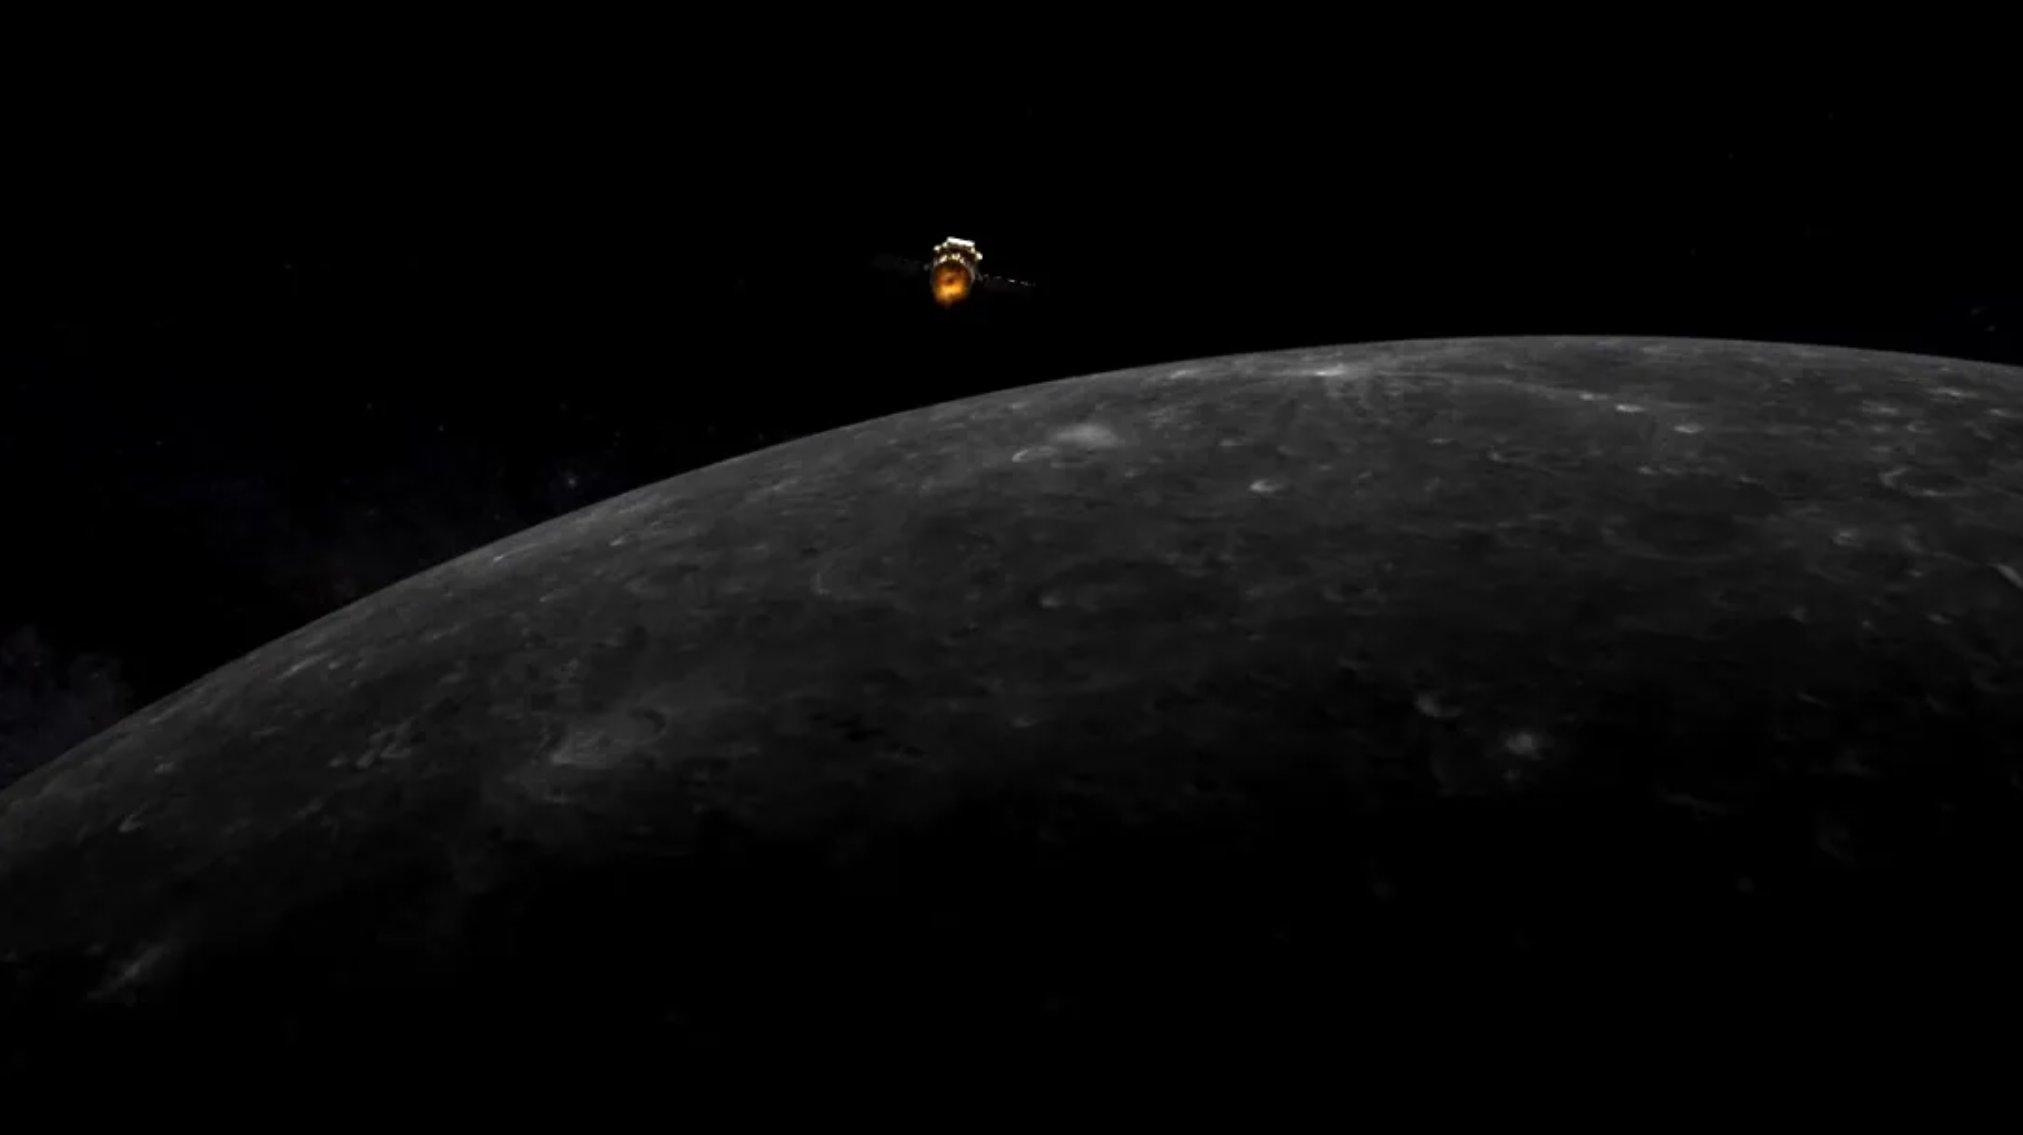 2020-28-nov-chang-e-5-enters-lunar-orbit